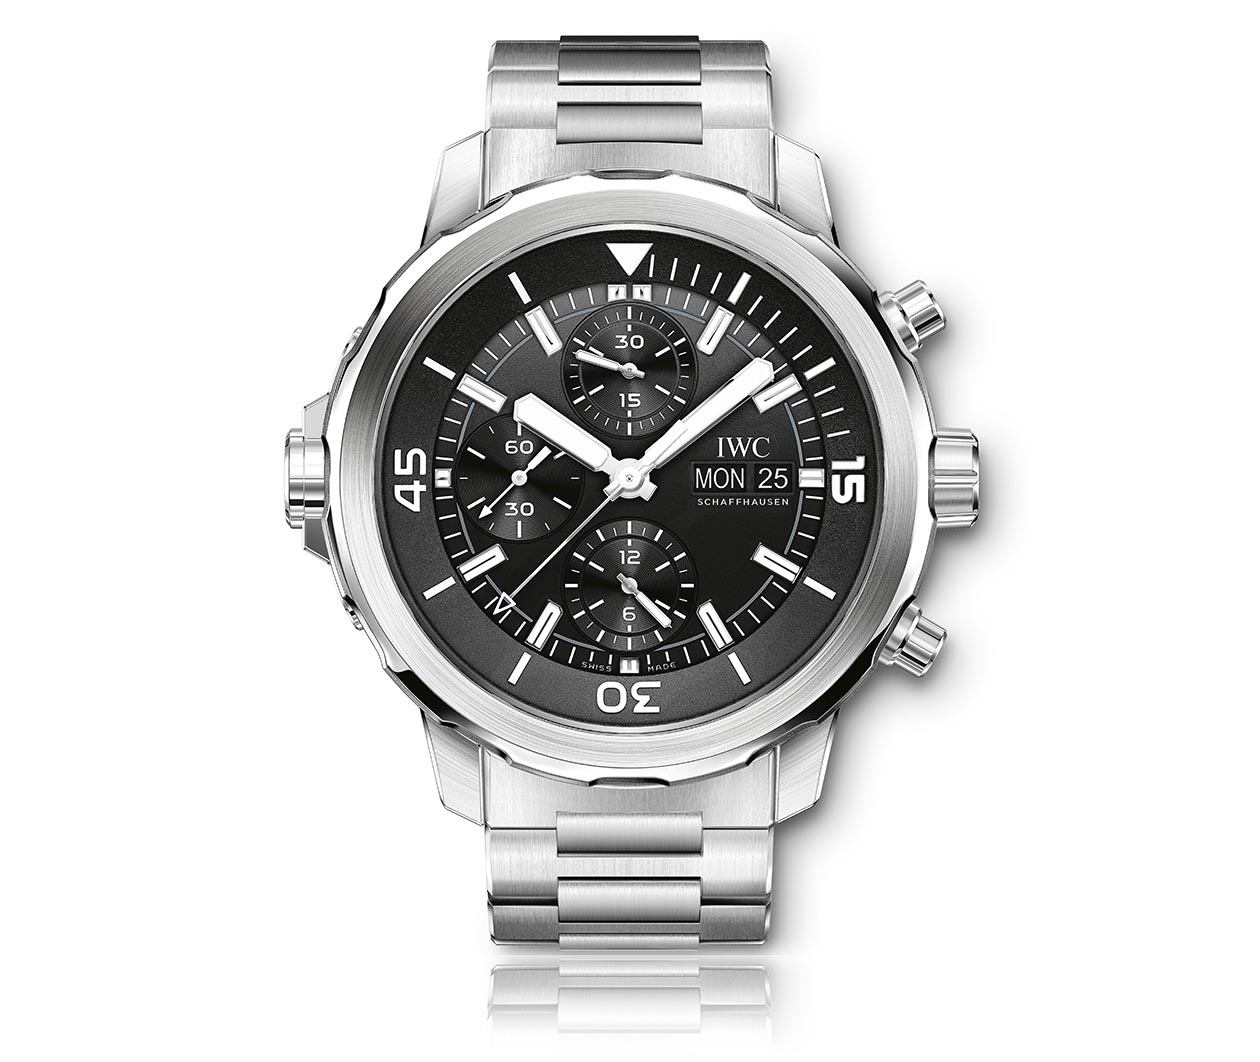 IWC Aquatimer Chronograph IW376804 Carousel 1 FINAL